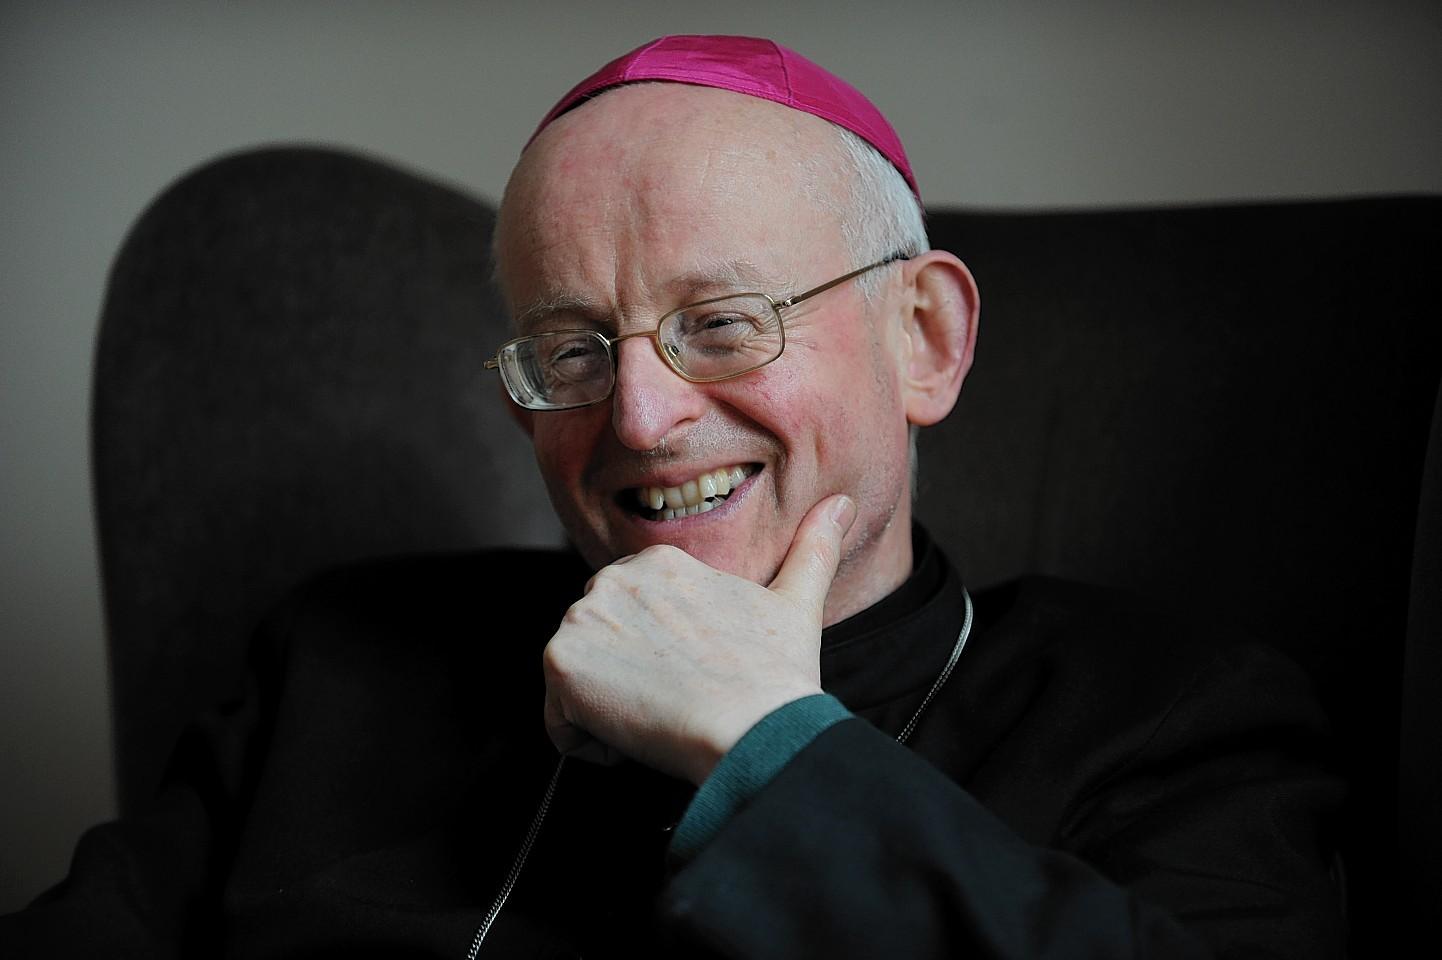 Bishop of Aberdeen, Rt Rev Hugh Gilbert